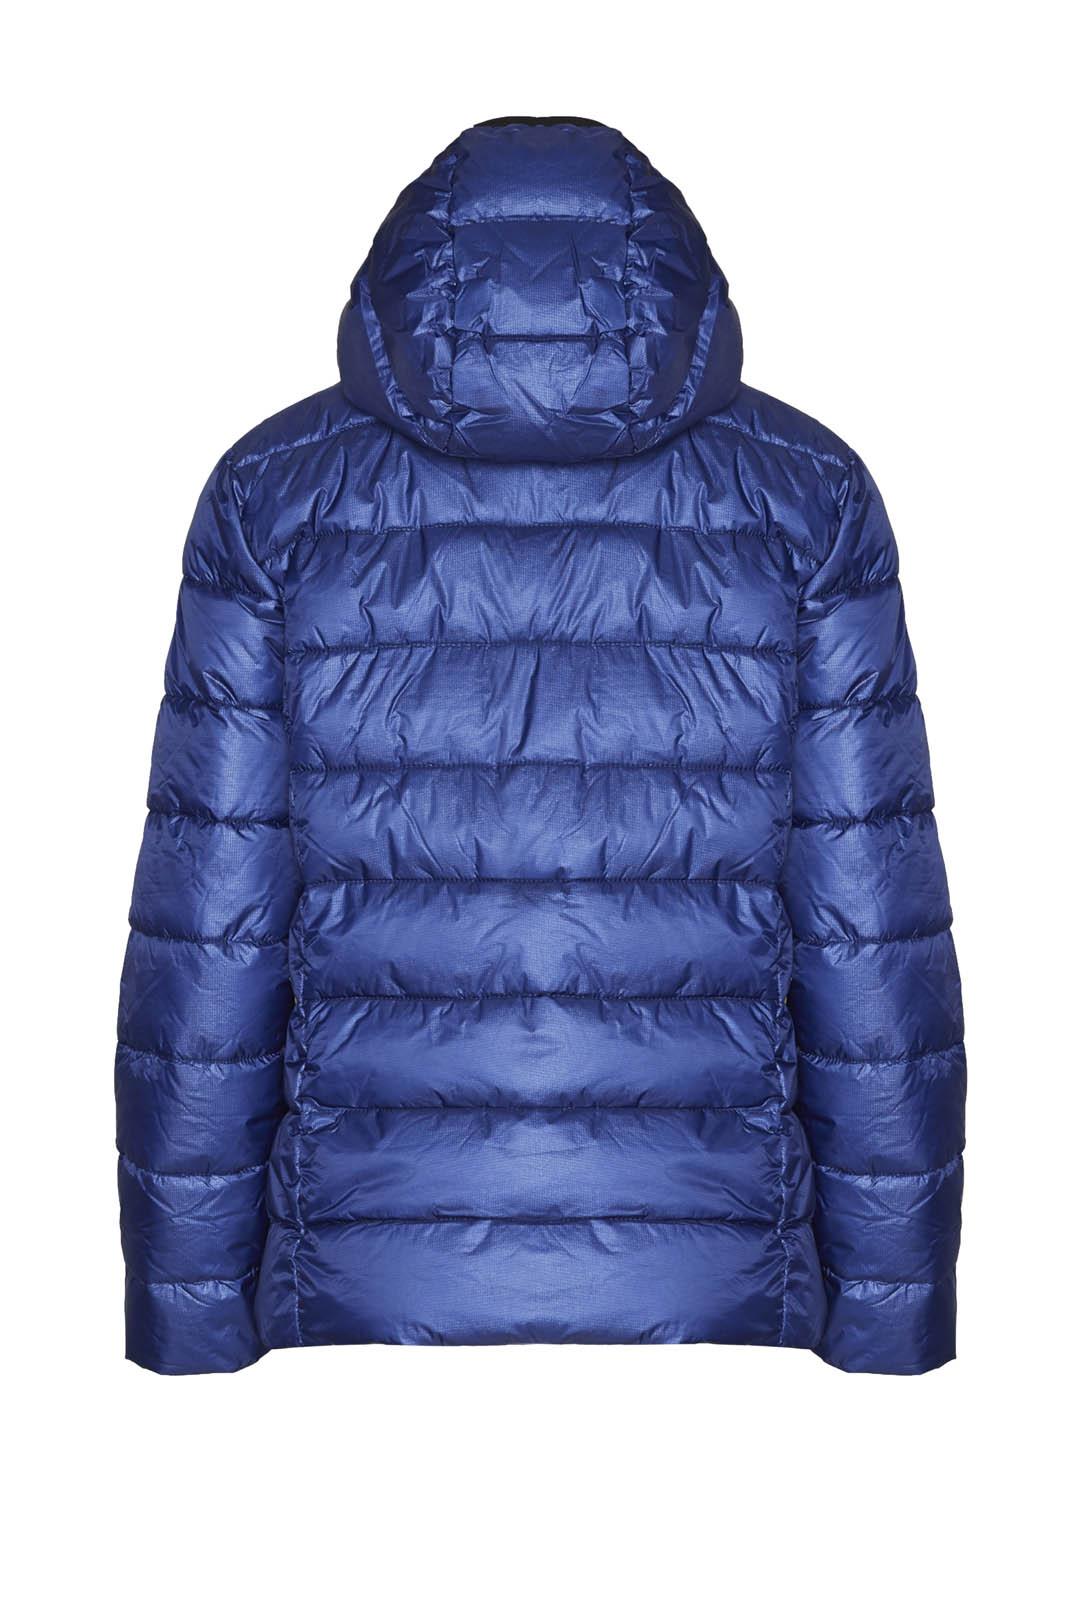 Padded jacket with hood                  2